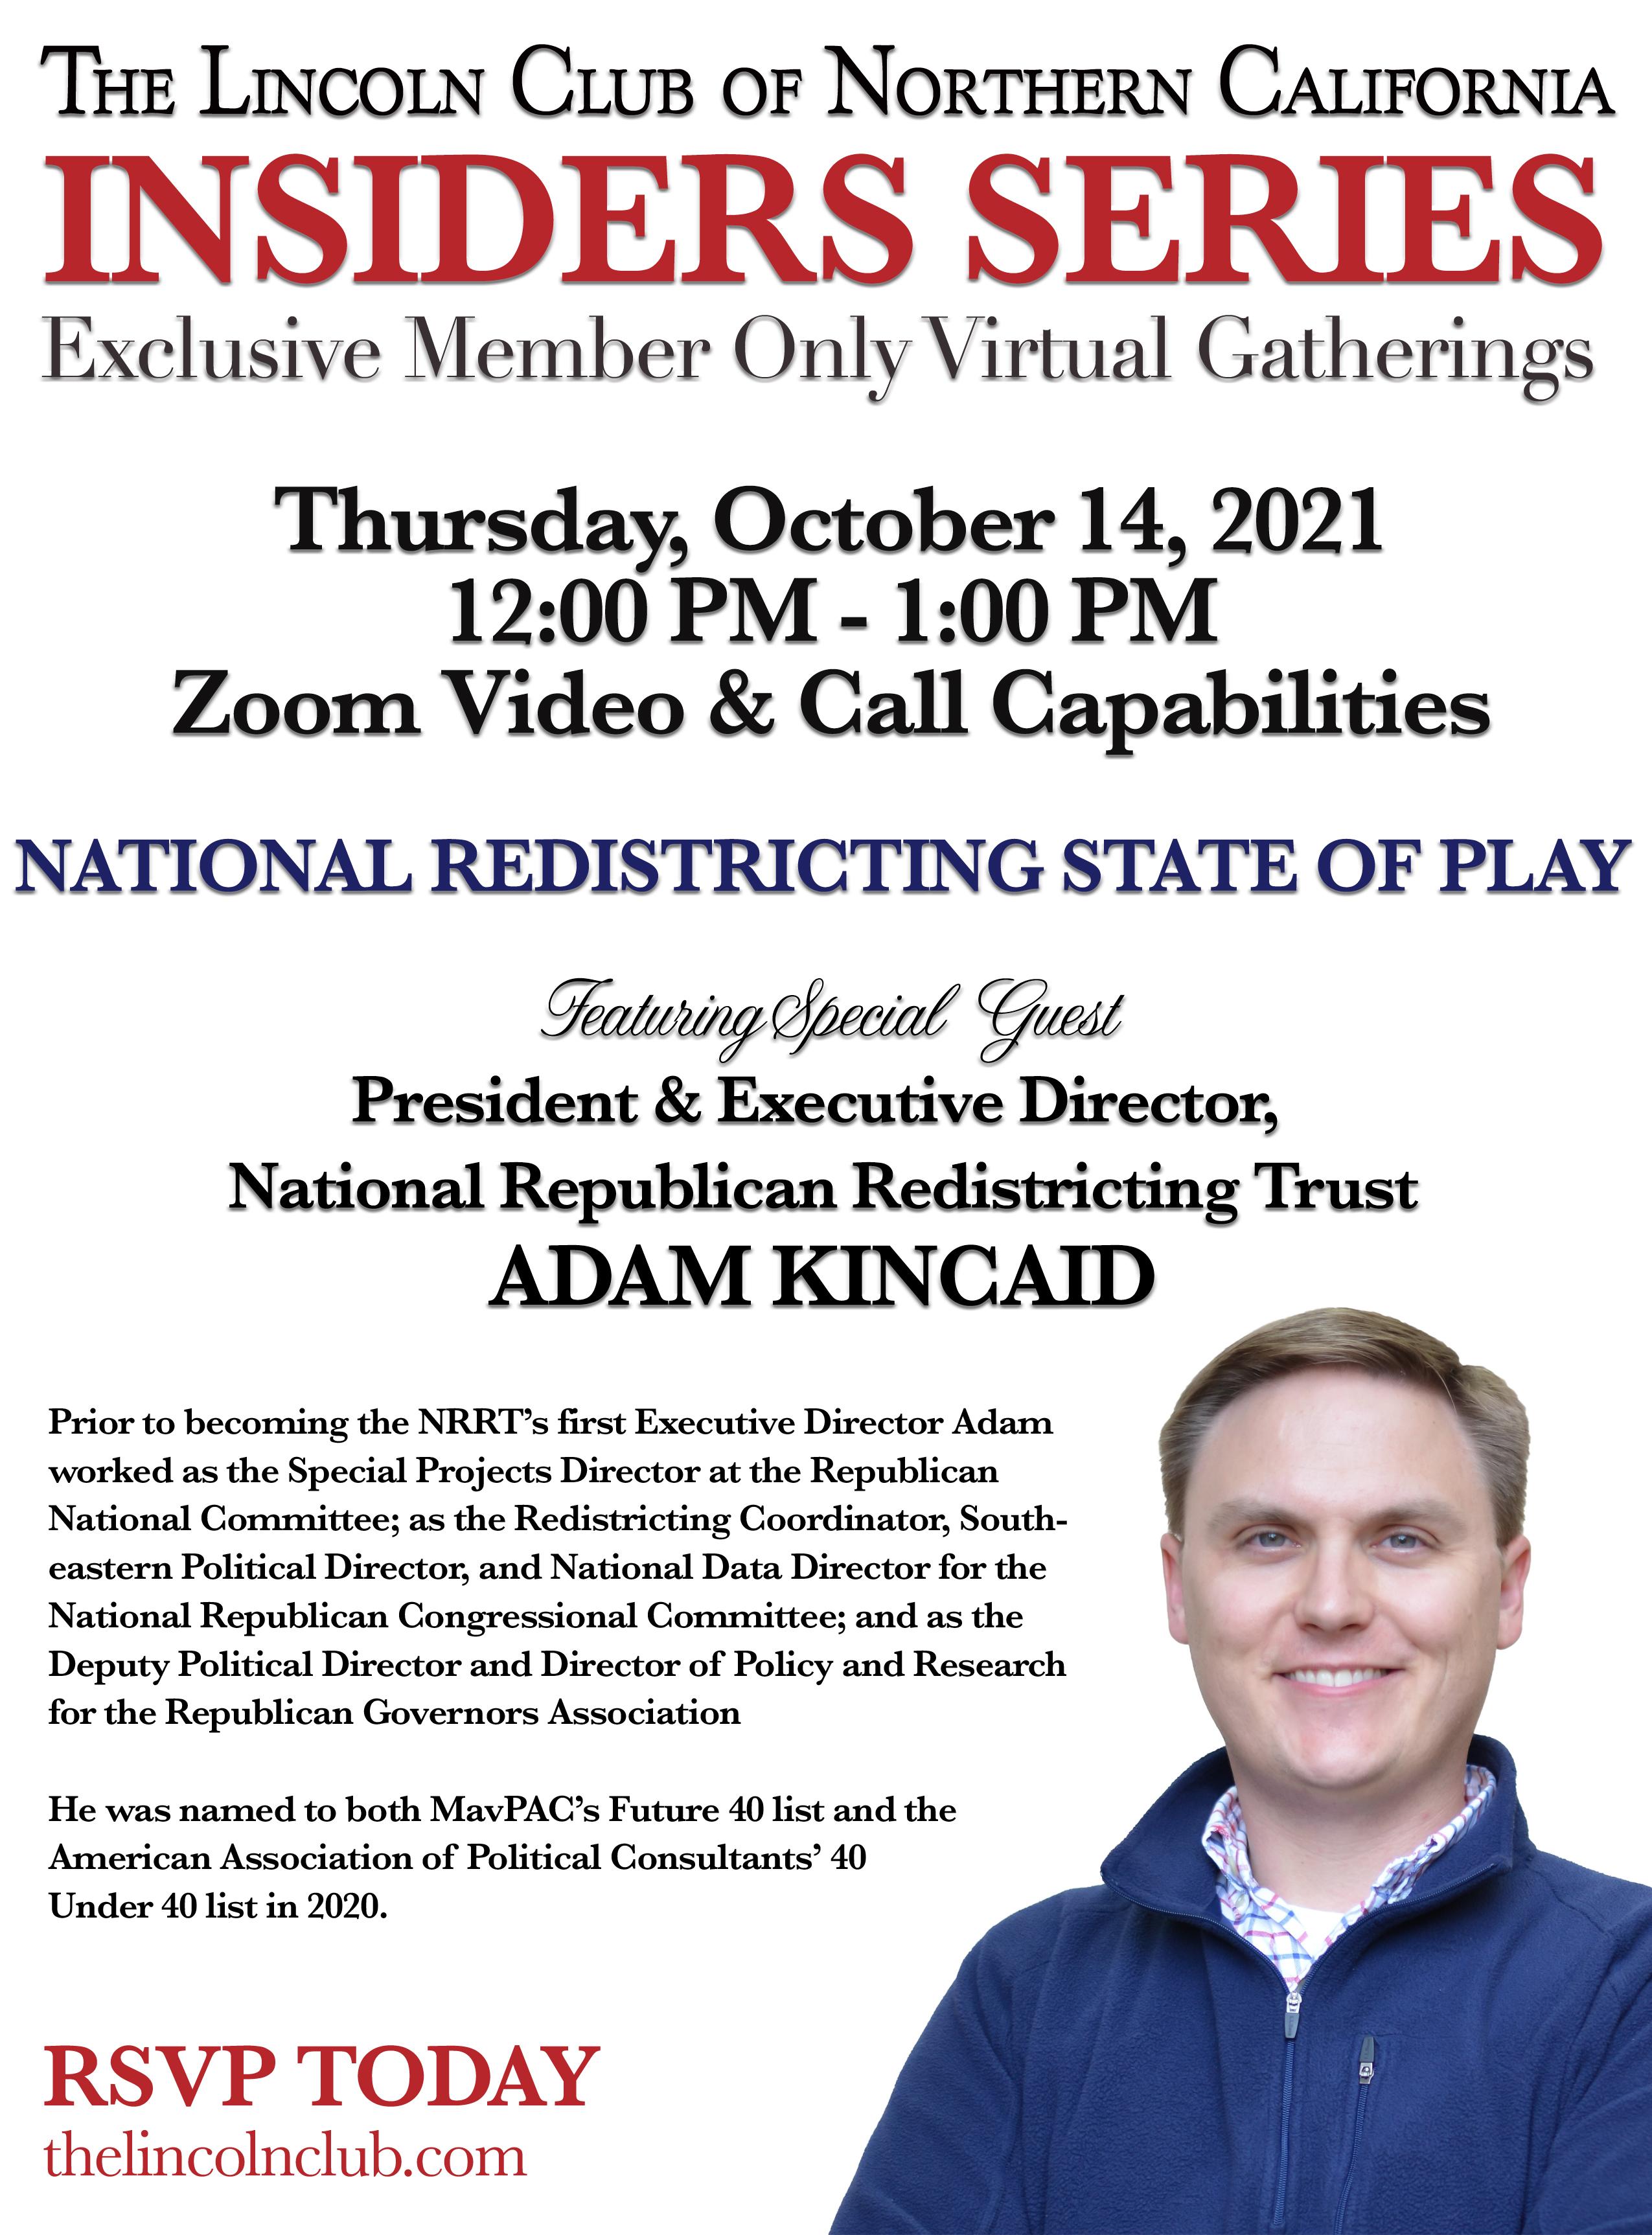 Insiders Series with Adam Kincaid